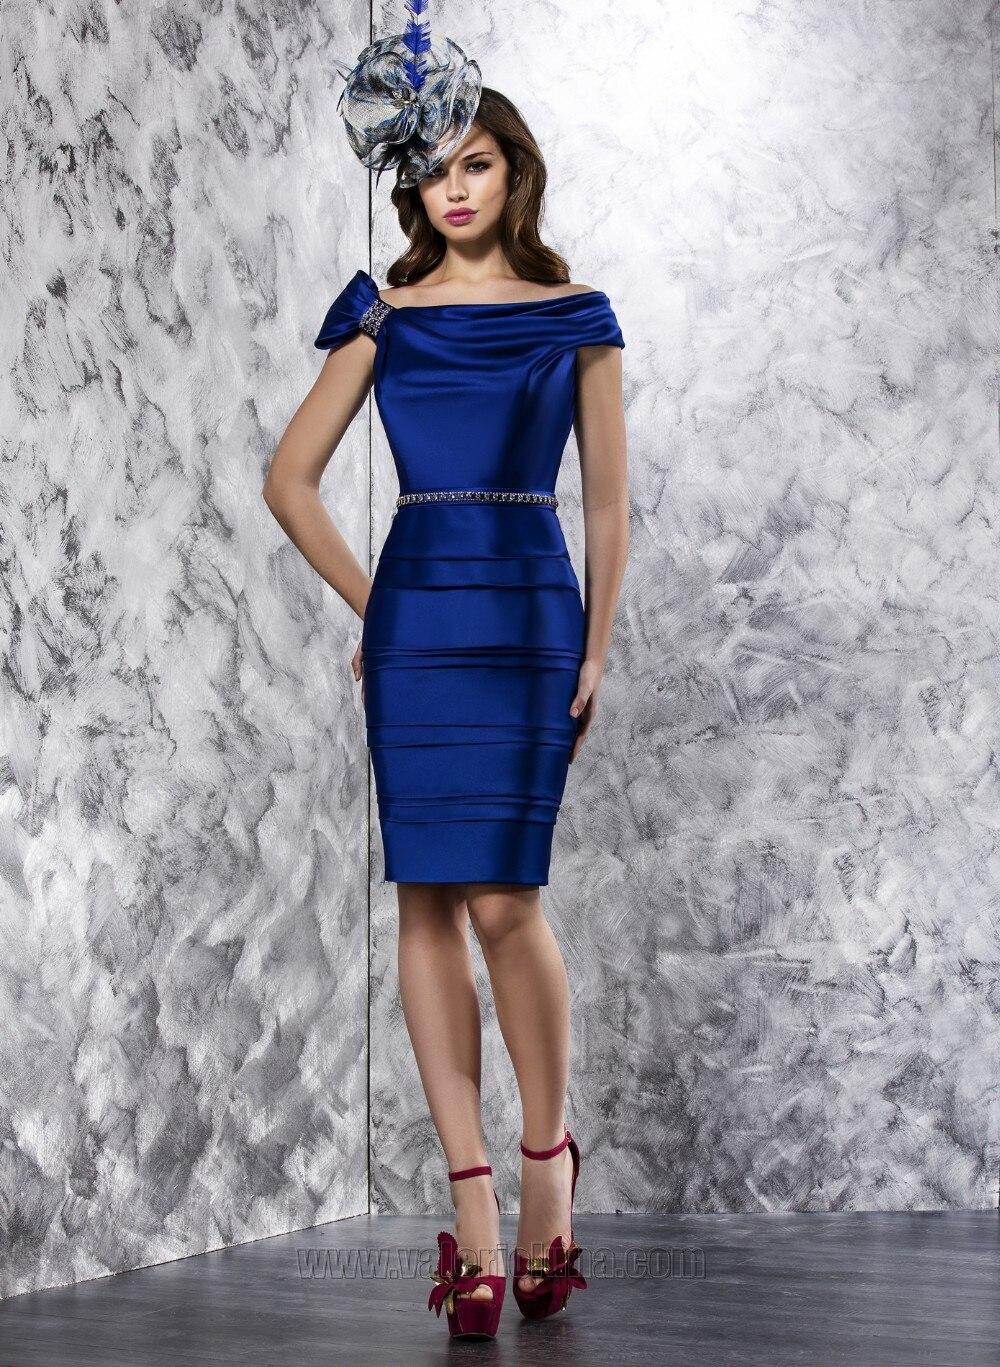 New Gorgeous Plus Size Short Vestidos De Madrina Bateau Knee Length Woman Groom Mother Of The Bride Wedding Evening Dresses 2015